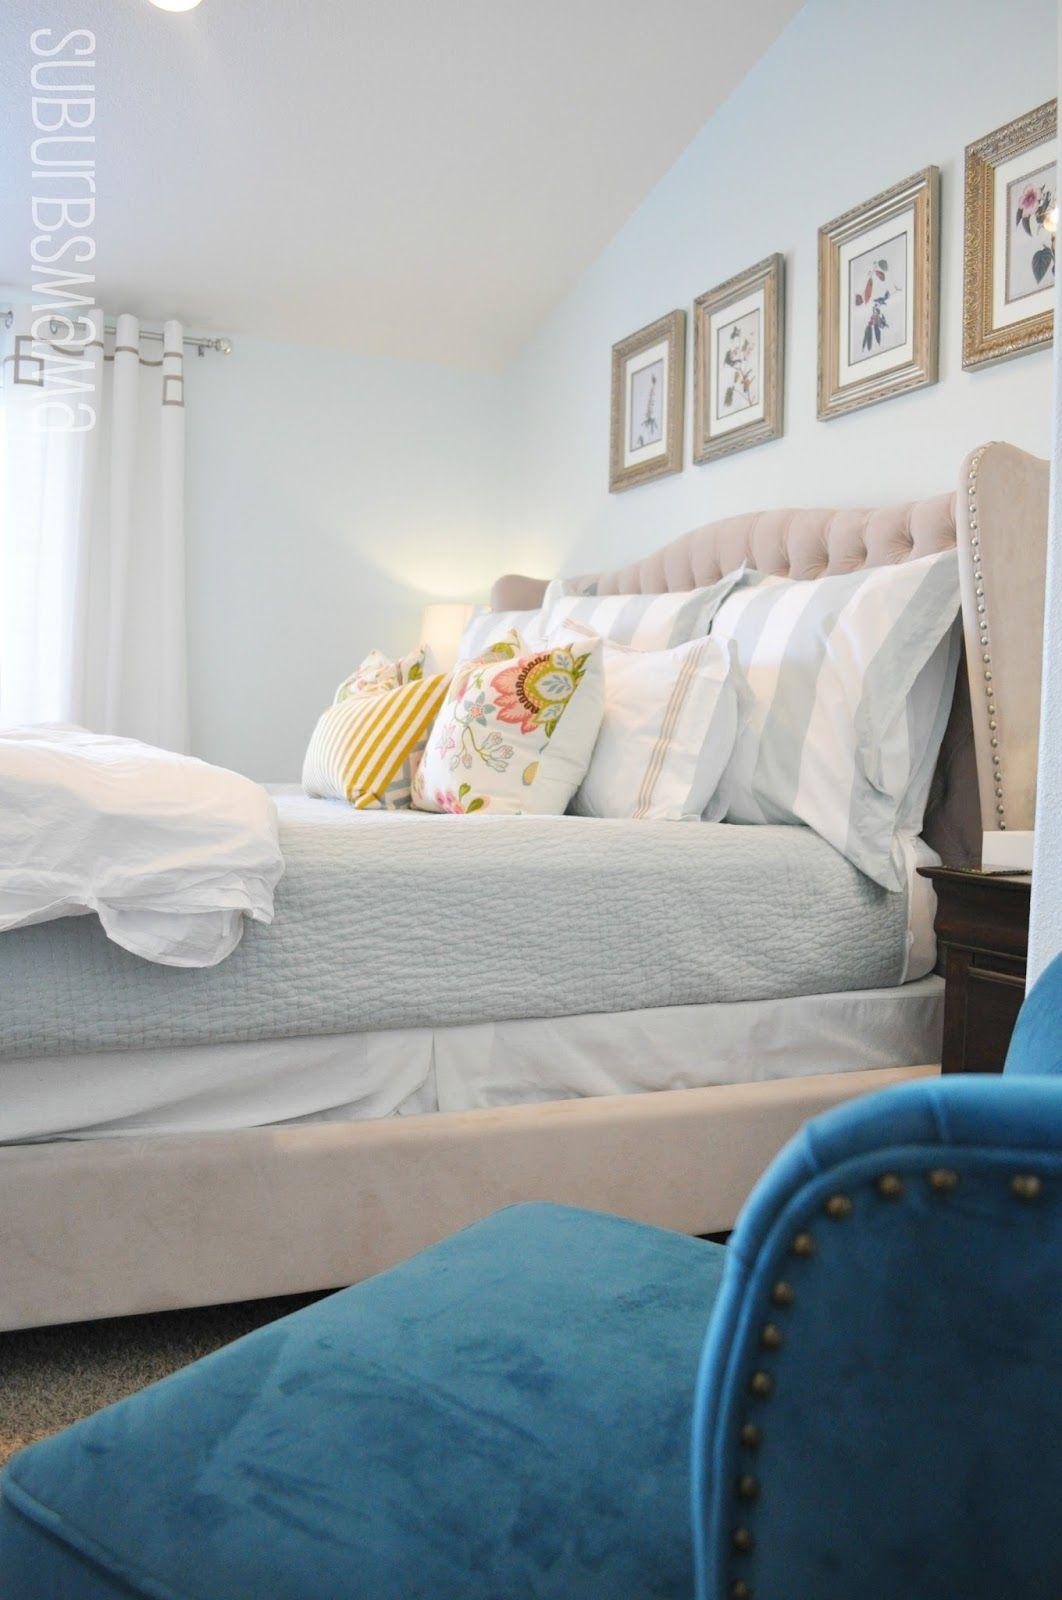 Suburbs Mama Nursery In Master Bedroom: Suburbs Mama: Master Bedroom Makeover Valspar Cool